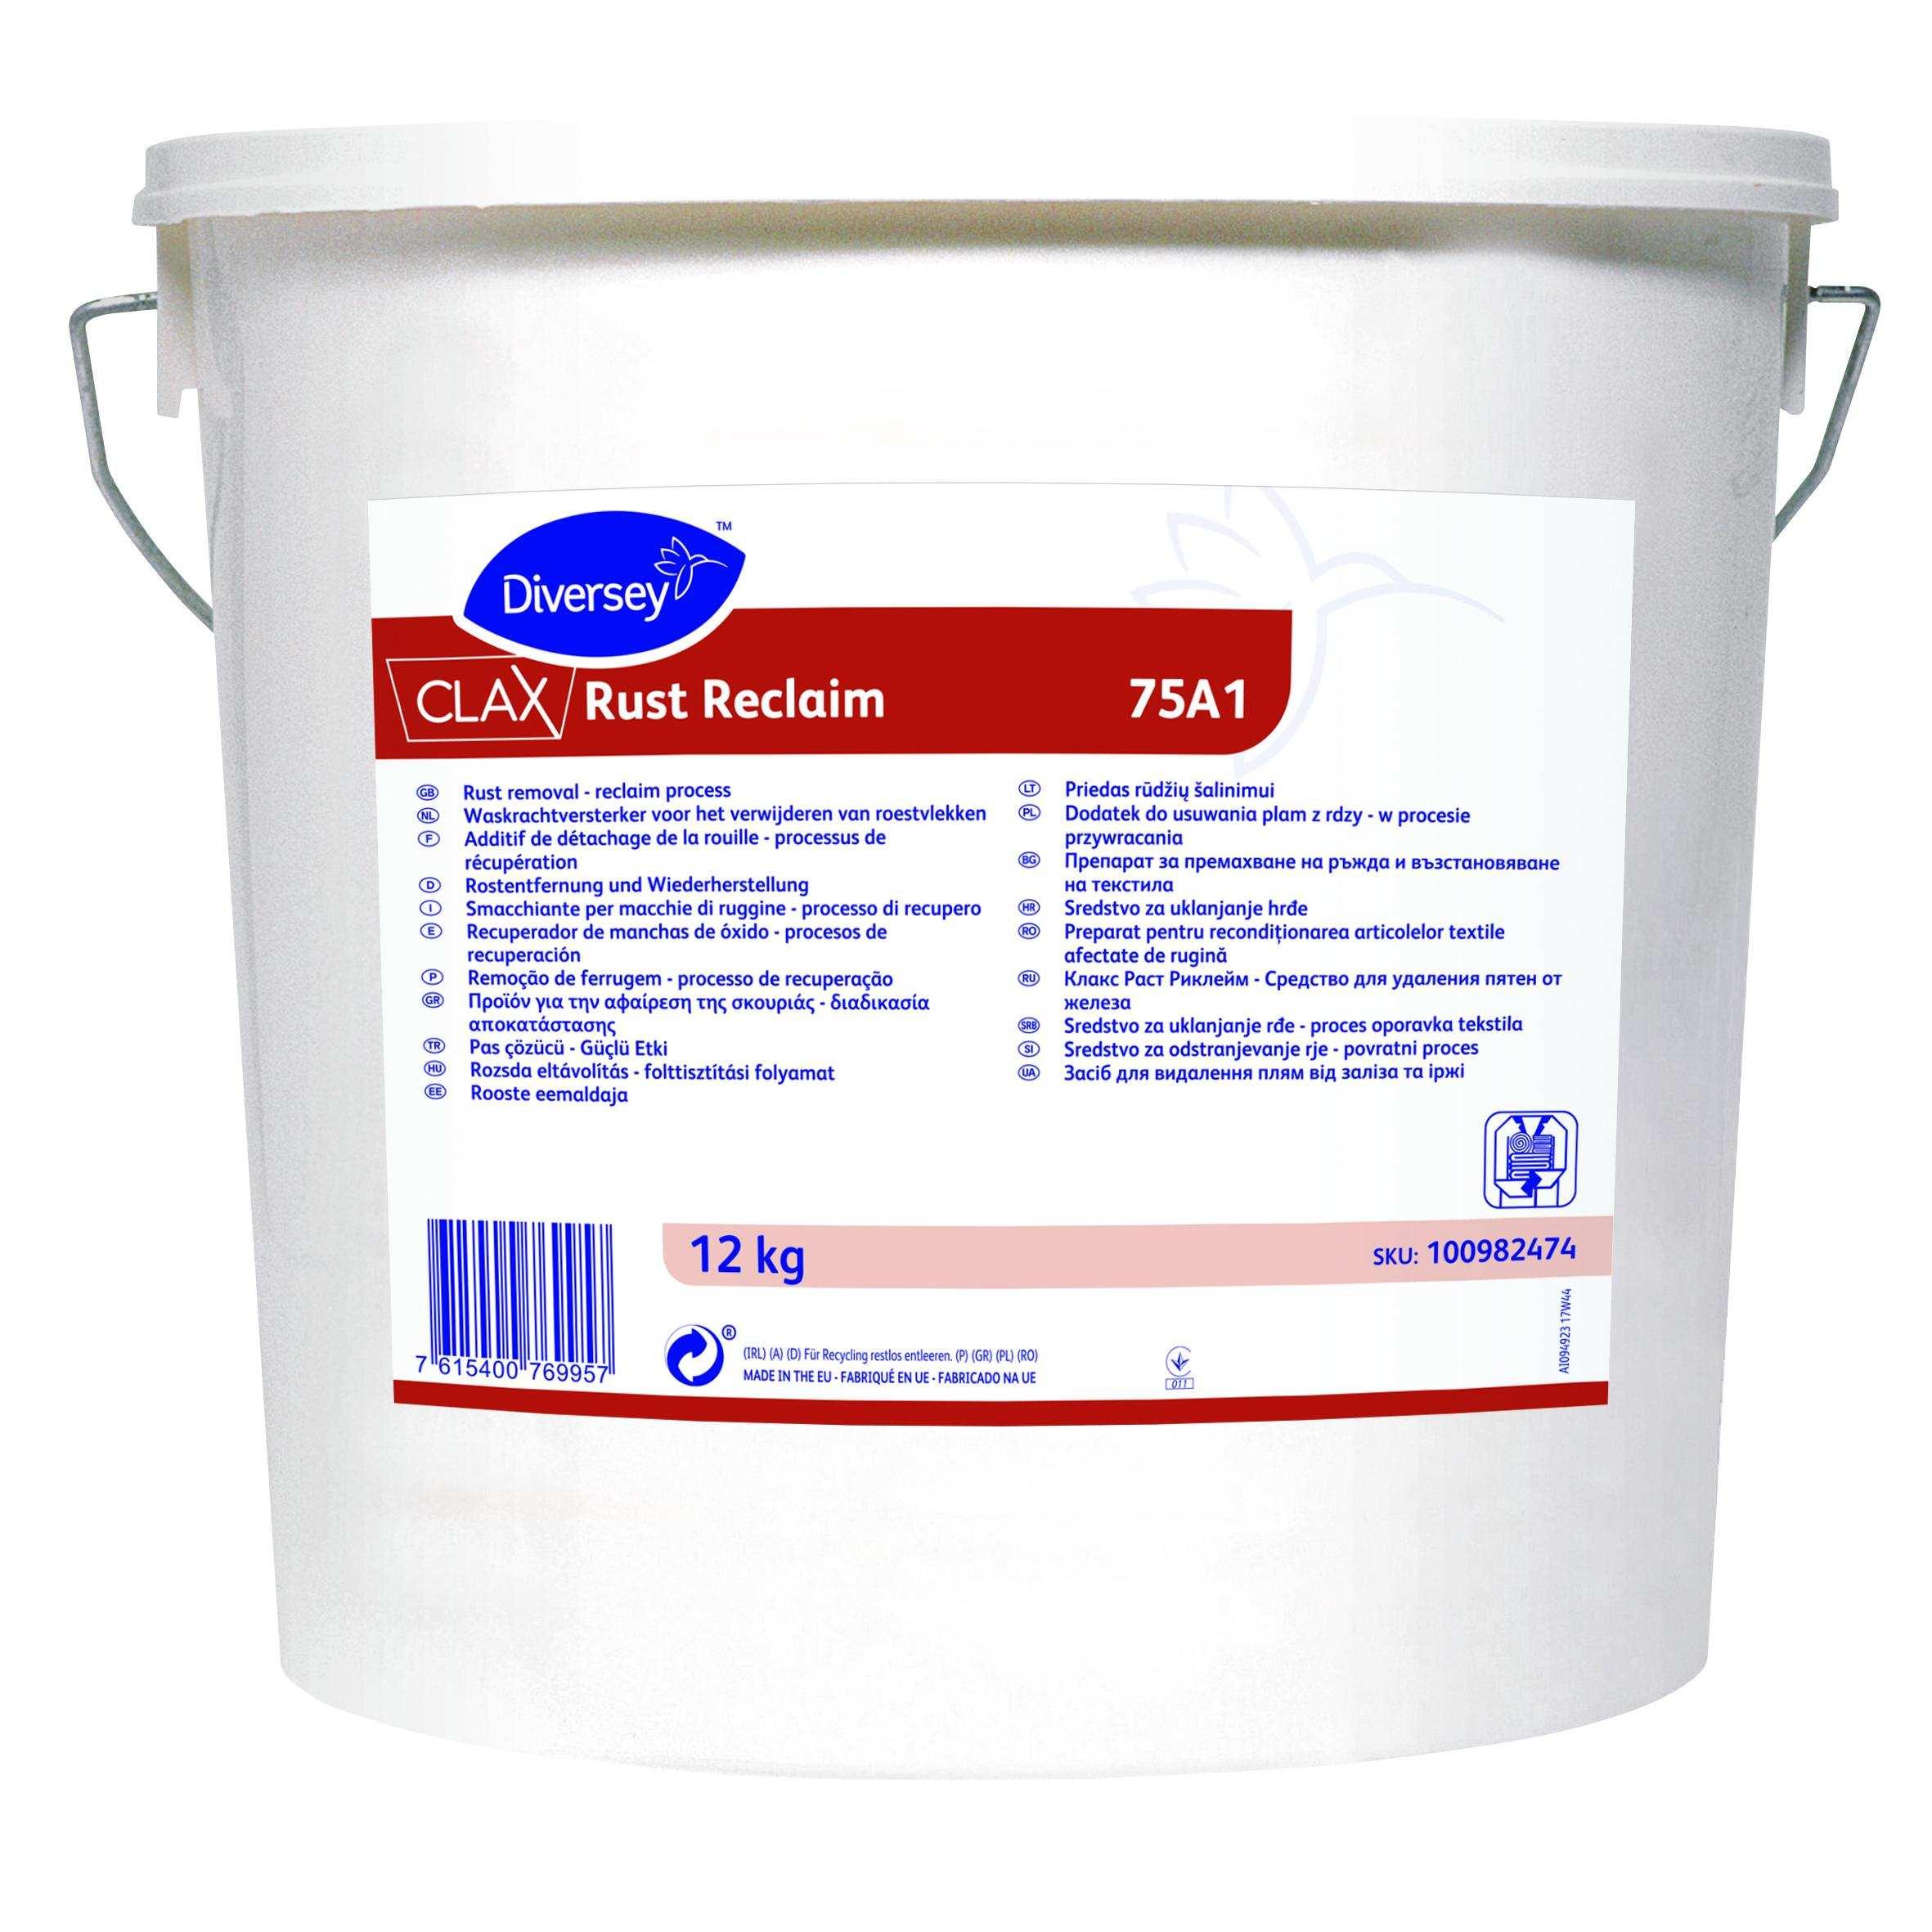 100982474-Clax-Rust-Reclaim-75a1-12kg-CMYK-20x20cm.jpg